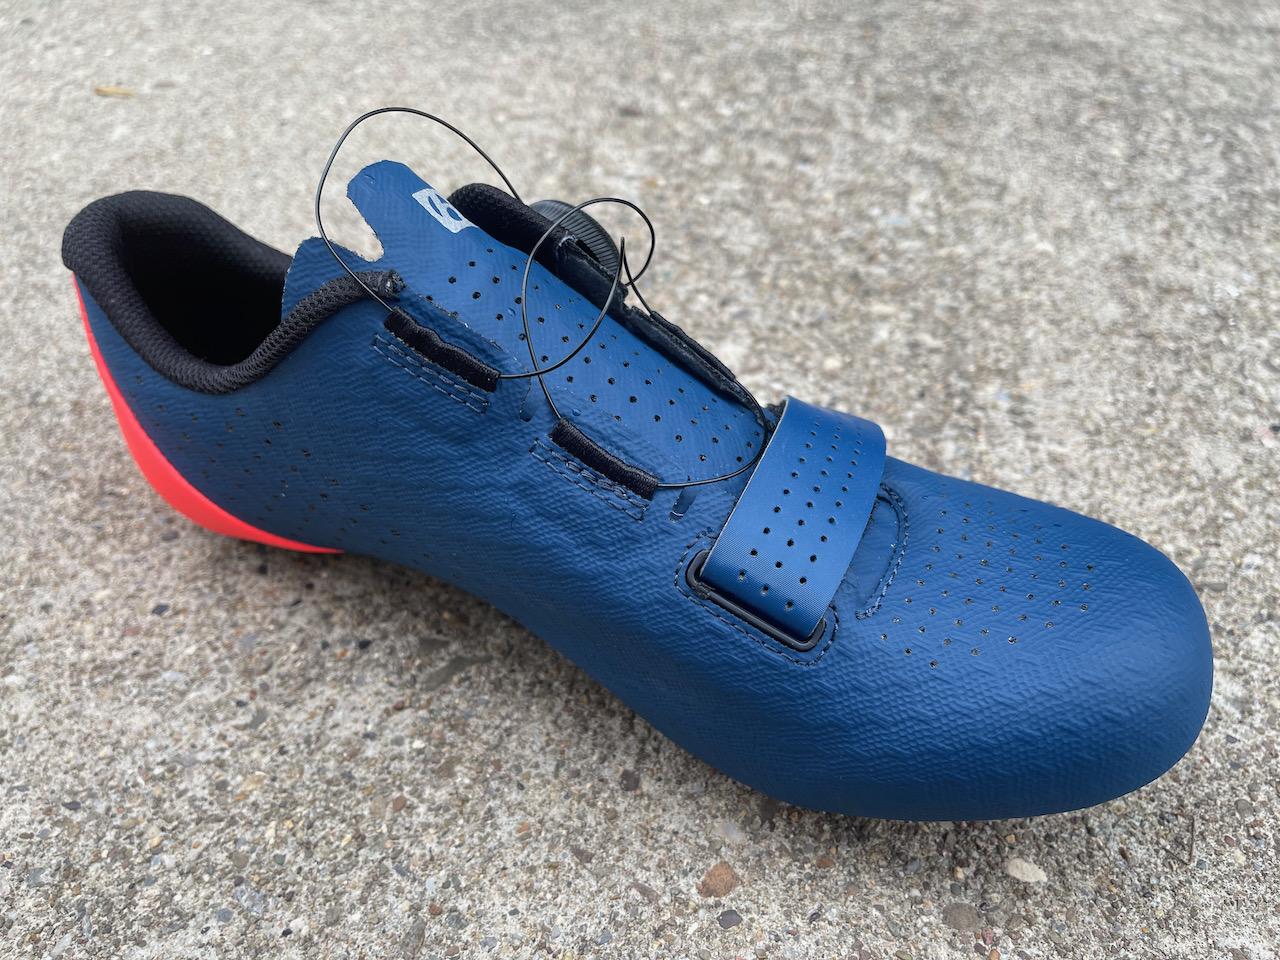 Bontrager Circuit shoe BOA close up